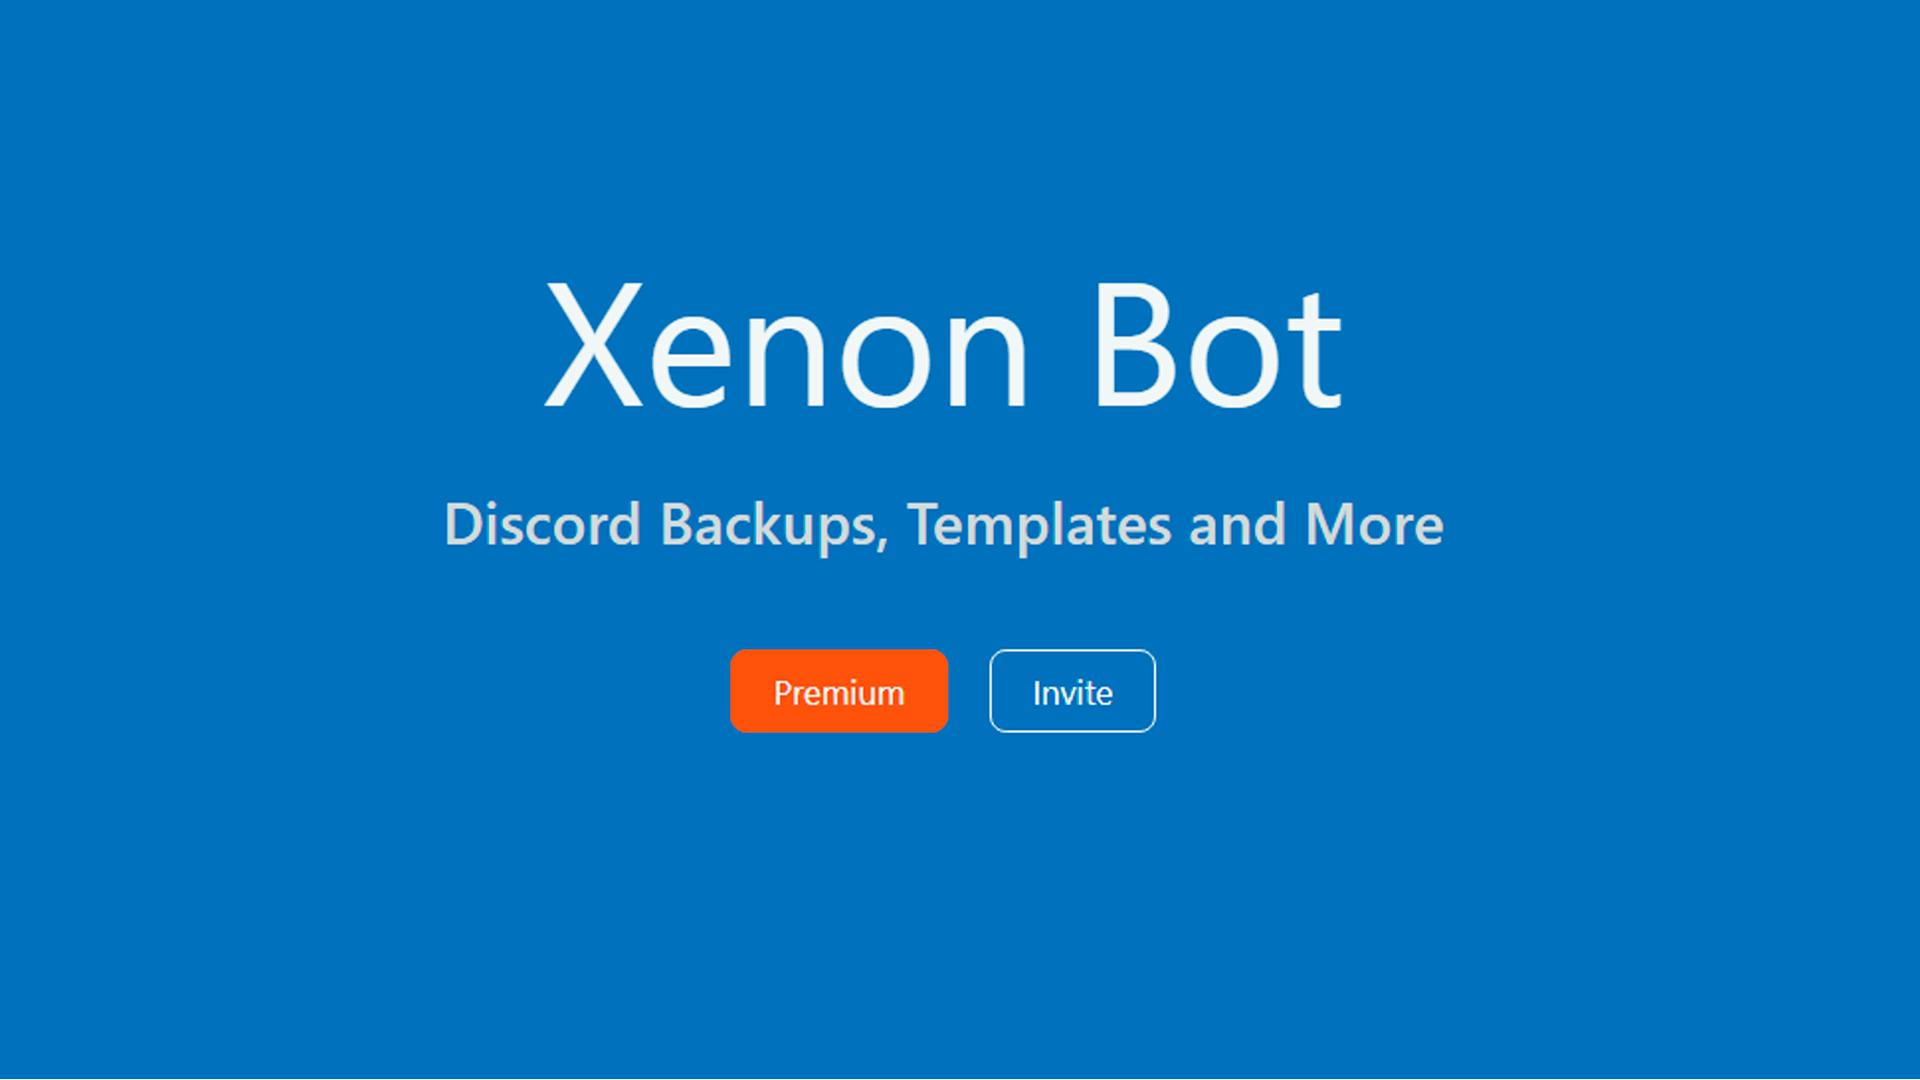 Veja como o Xenon bot pode te ajudar no Discord (Foto: Divulgação/Xenon Bot)